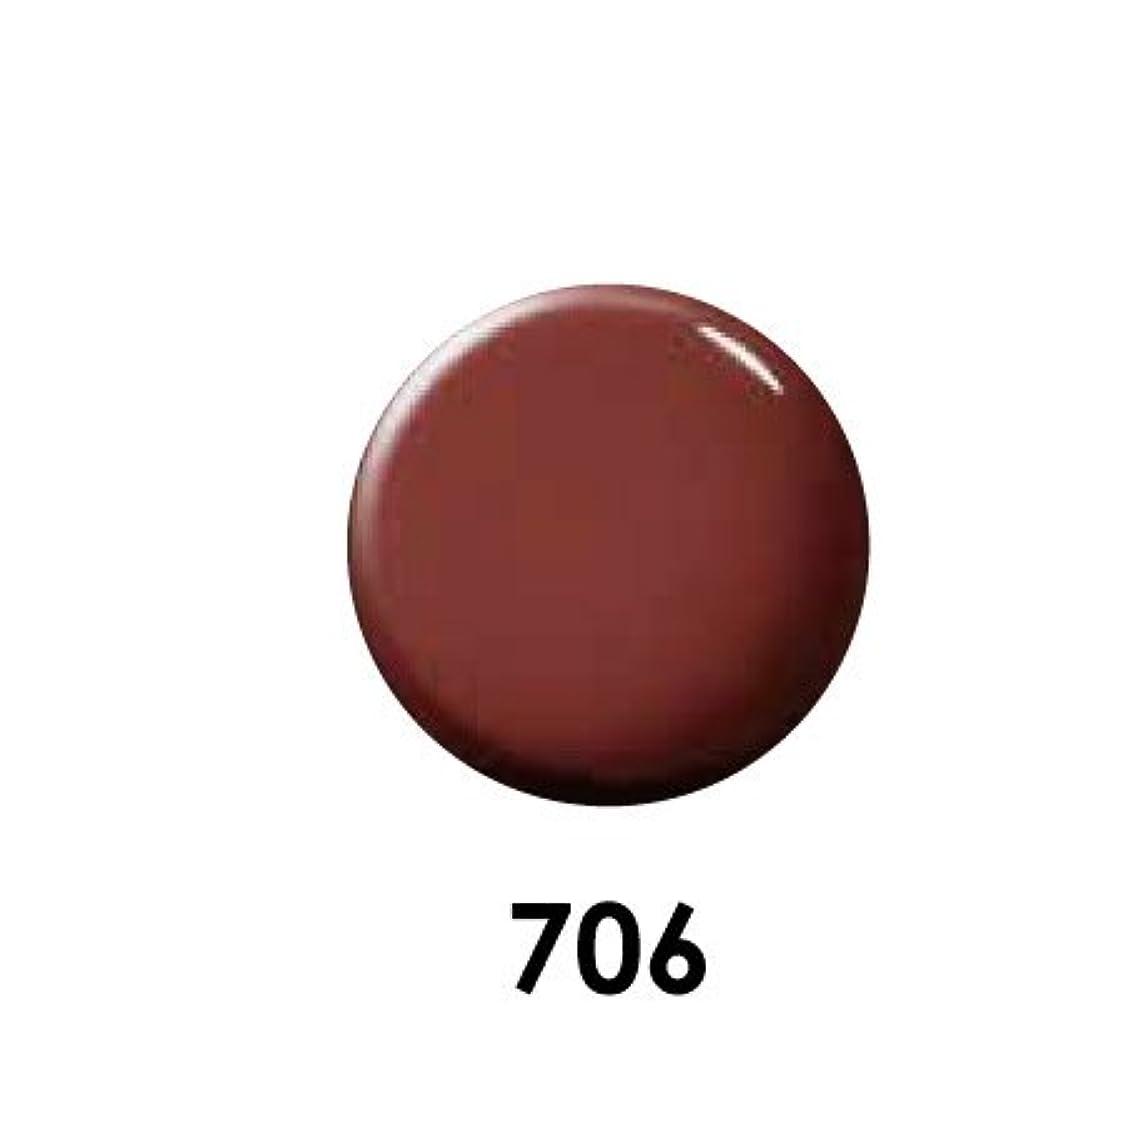 Putiel プティール カラージェル 706 サンダルウッド 4g (NAGISAプロデュース)